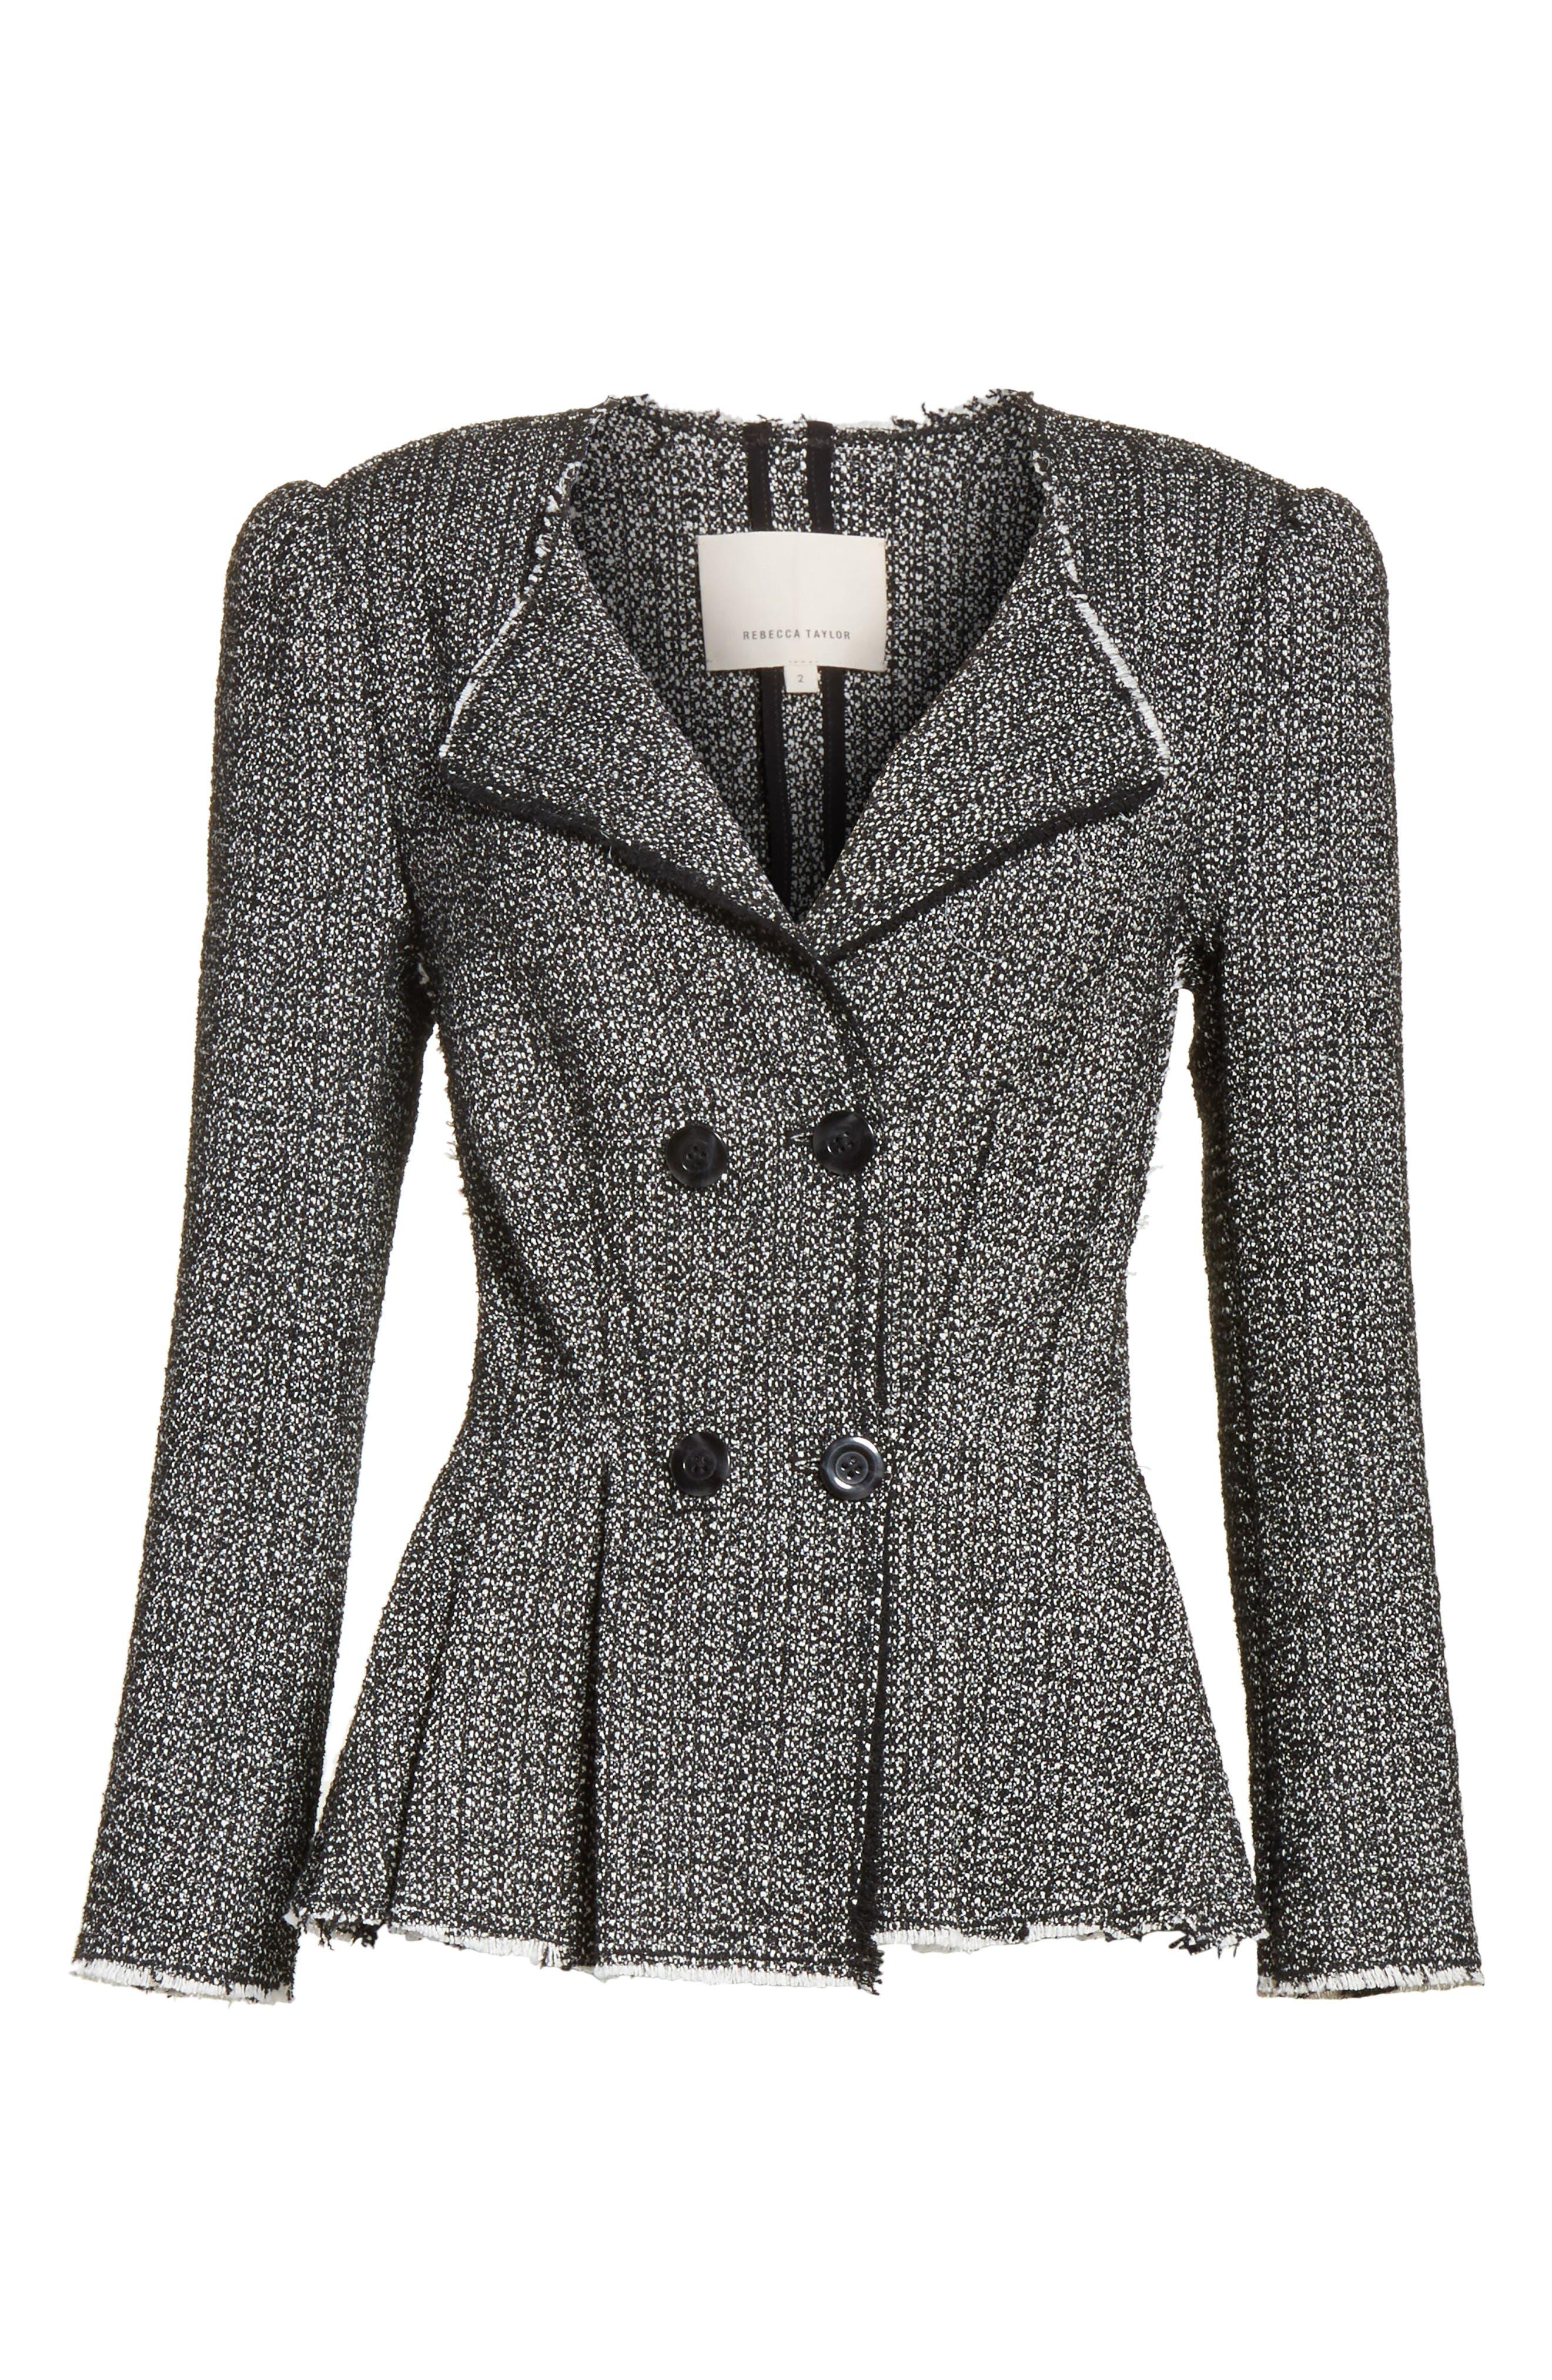 Texture Tweed Jacket,                             Alternate thumbnail 6, color,                             Black Combo